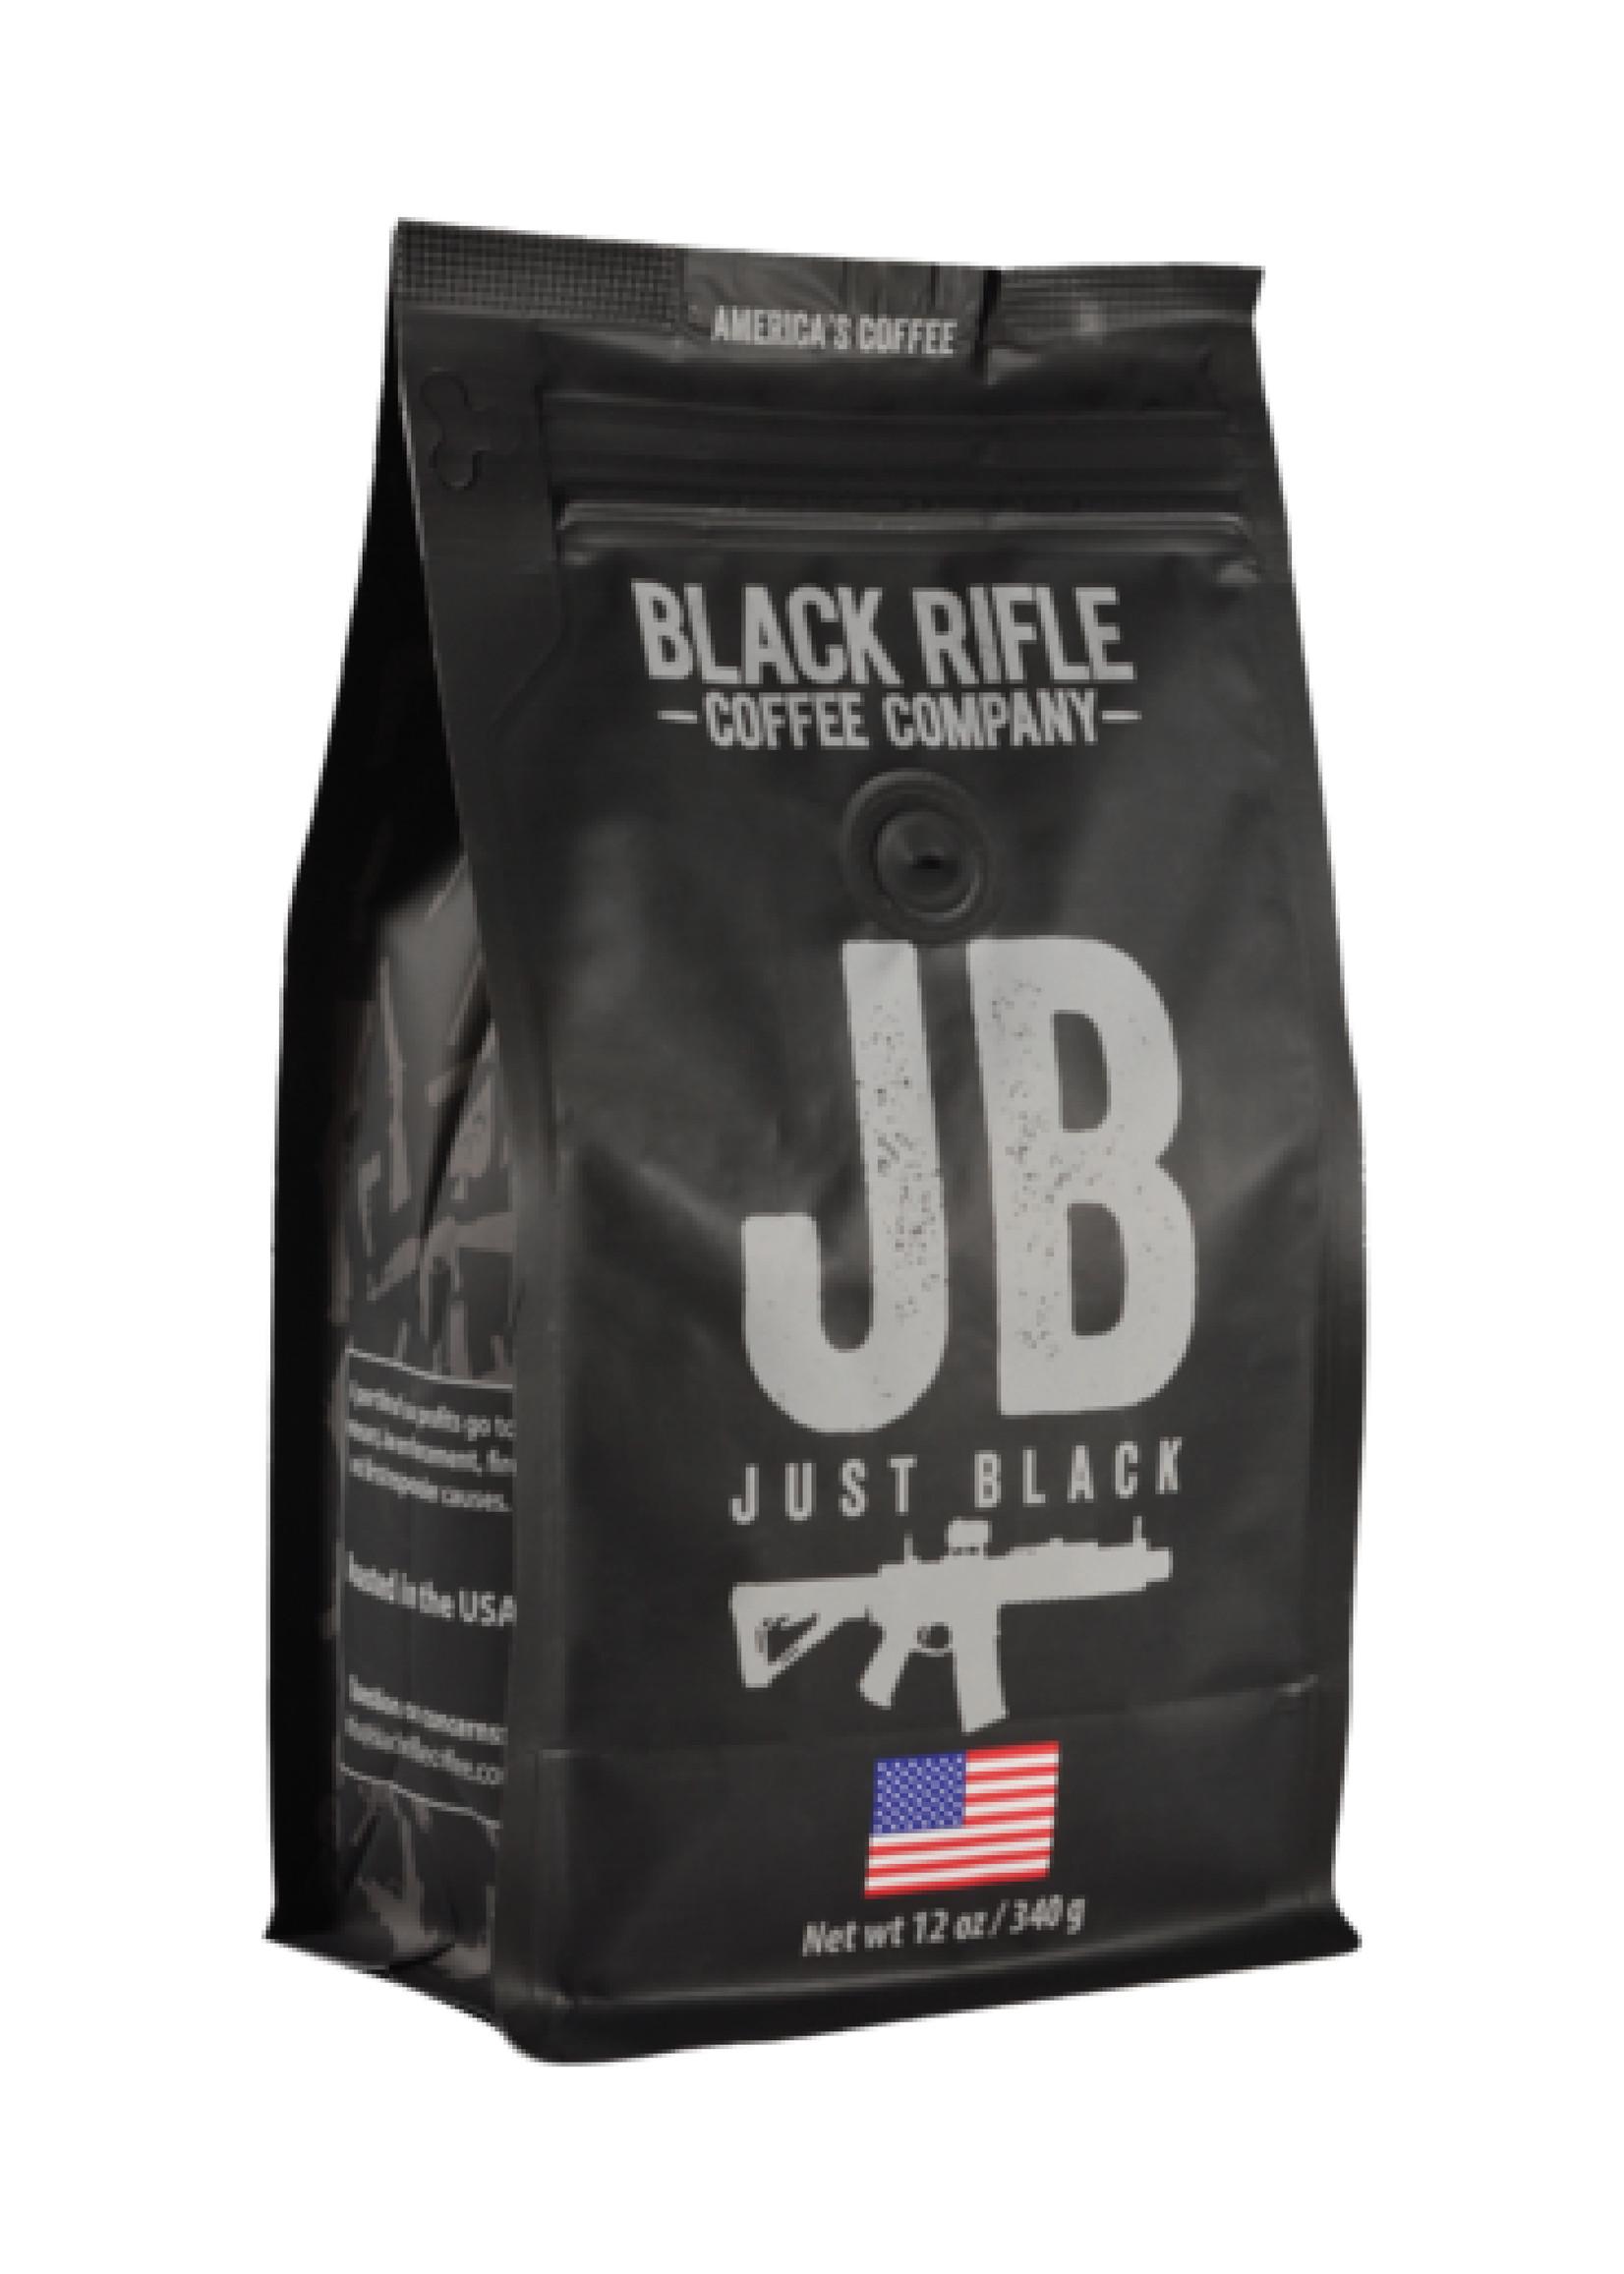 Black Rifle Coffee Company Black Rifle Coffee Company Just Black Coffee Roast Whole Bean